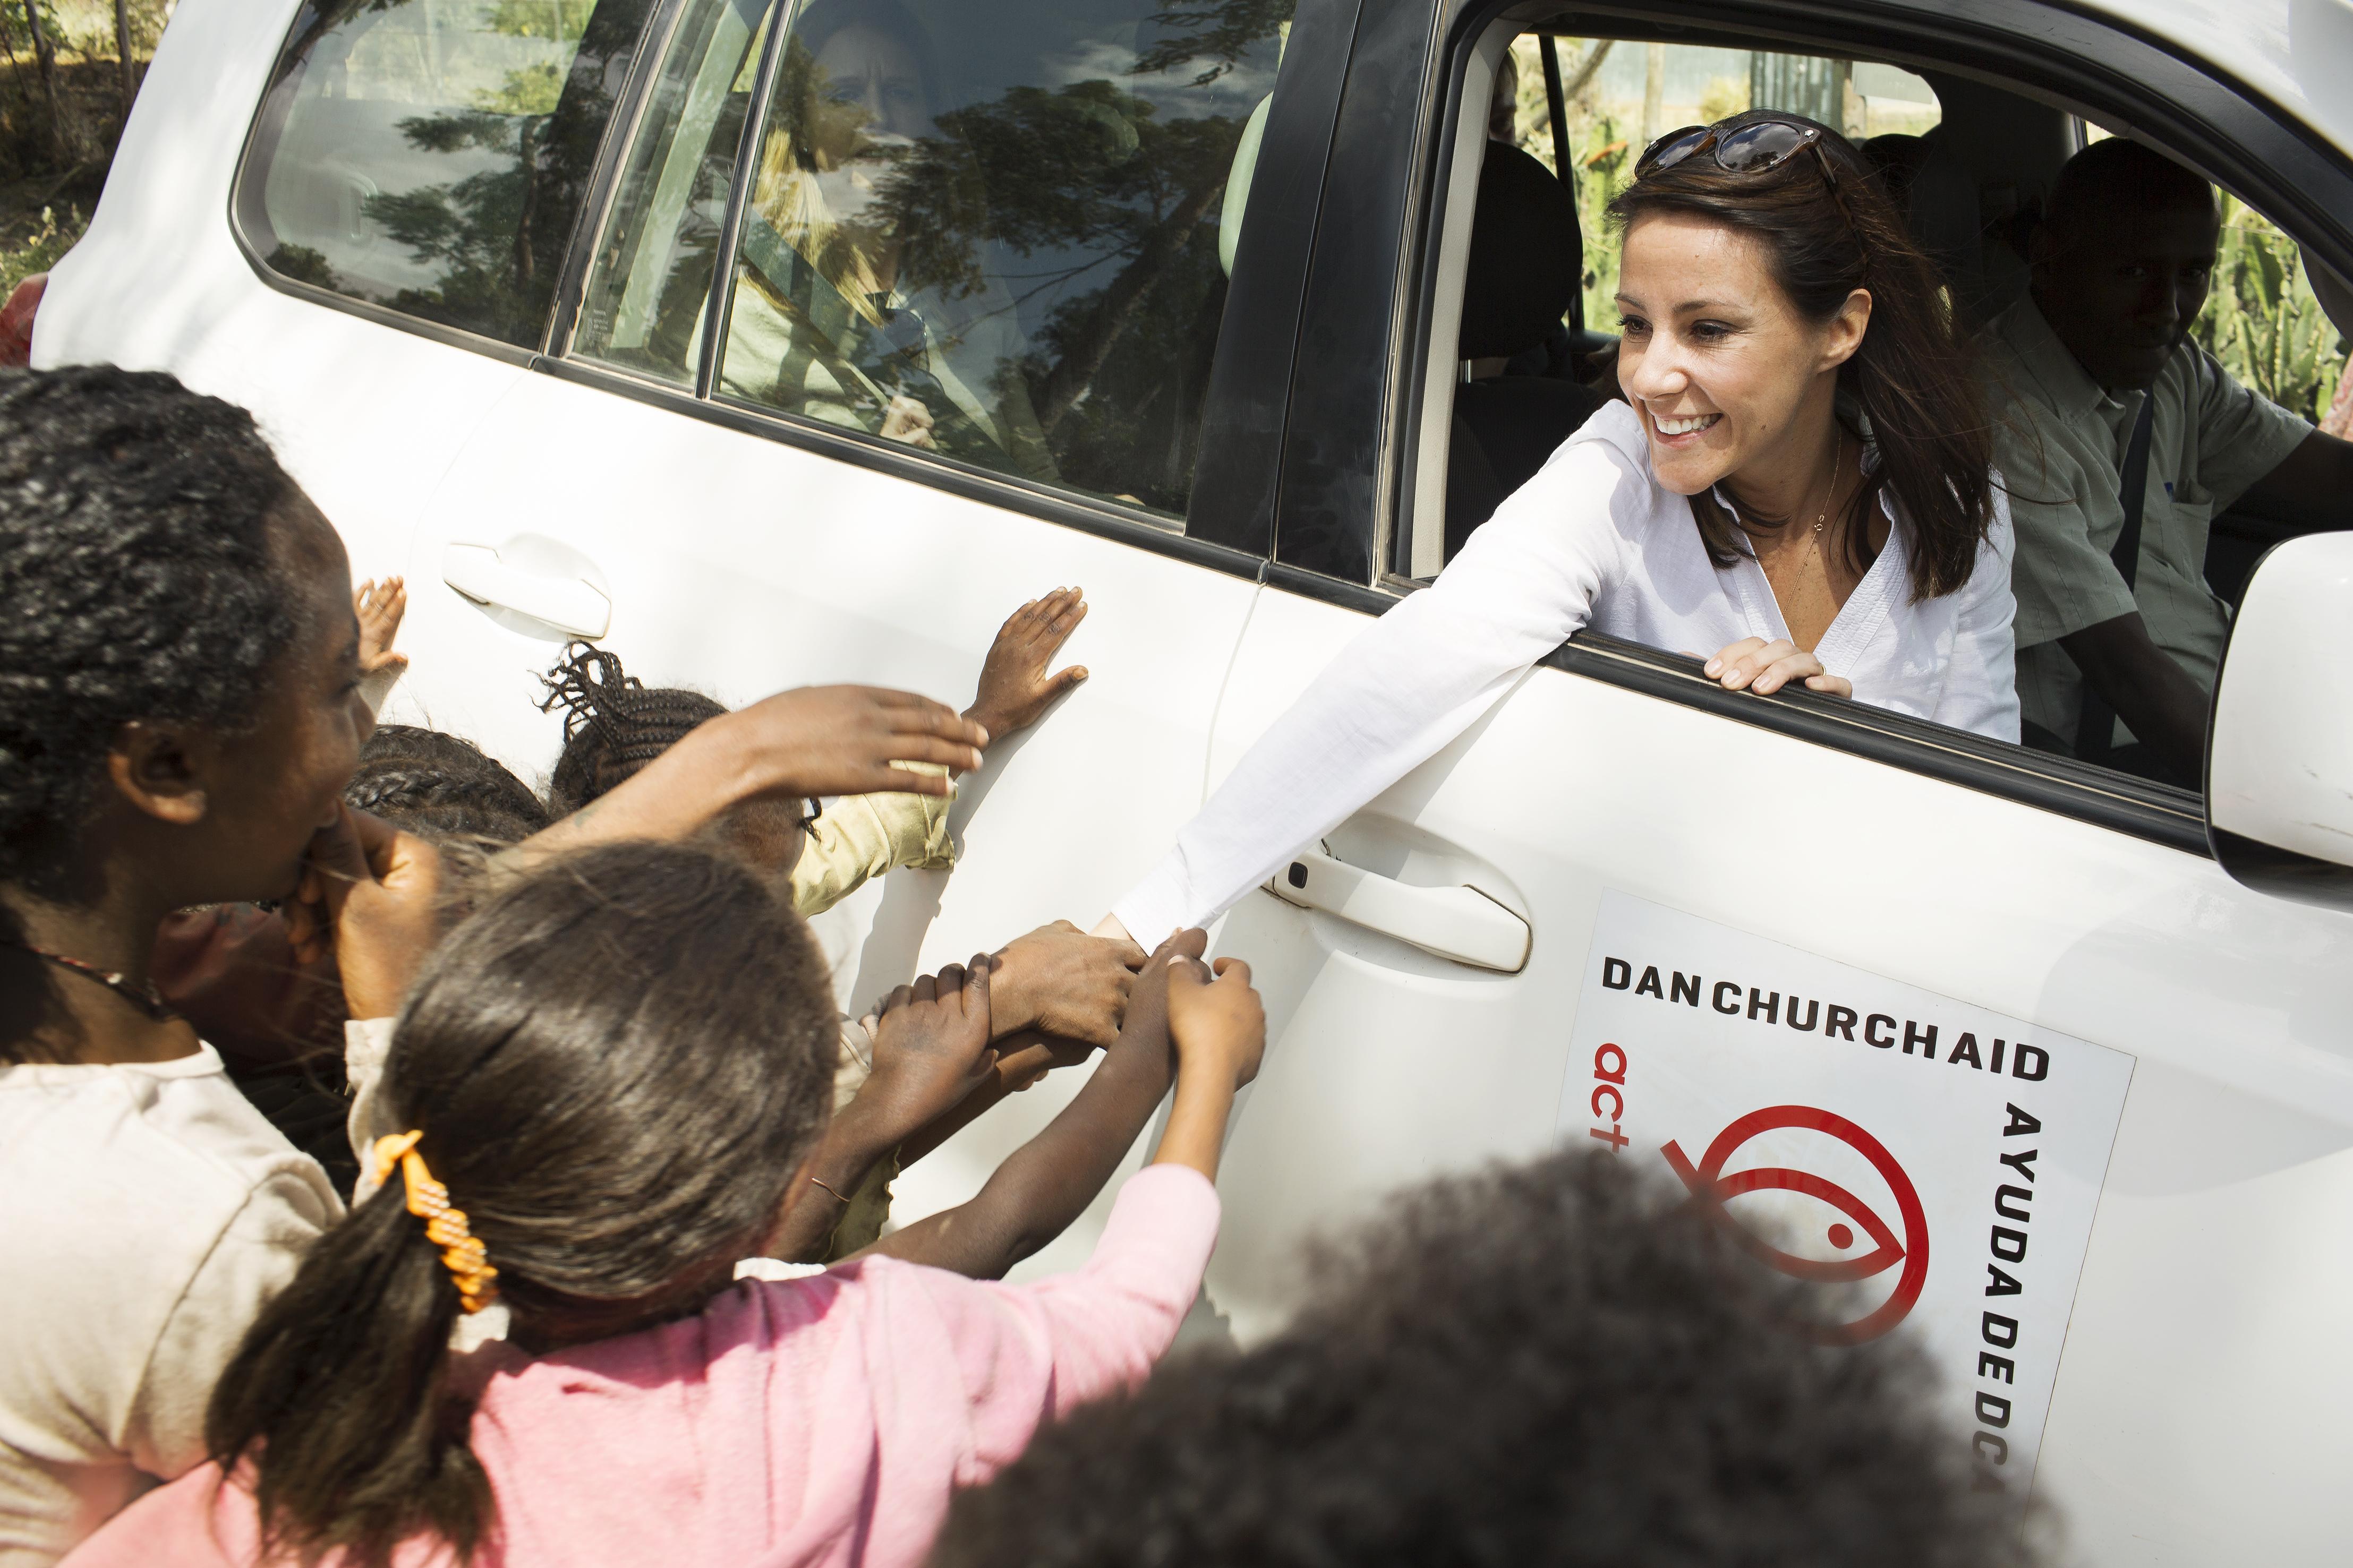 Prinsesse Marie, Folkekirkens Nødhjælp. (Foto: PR)